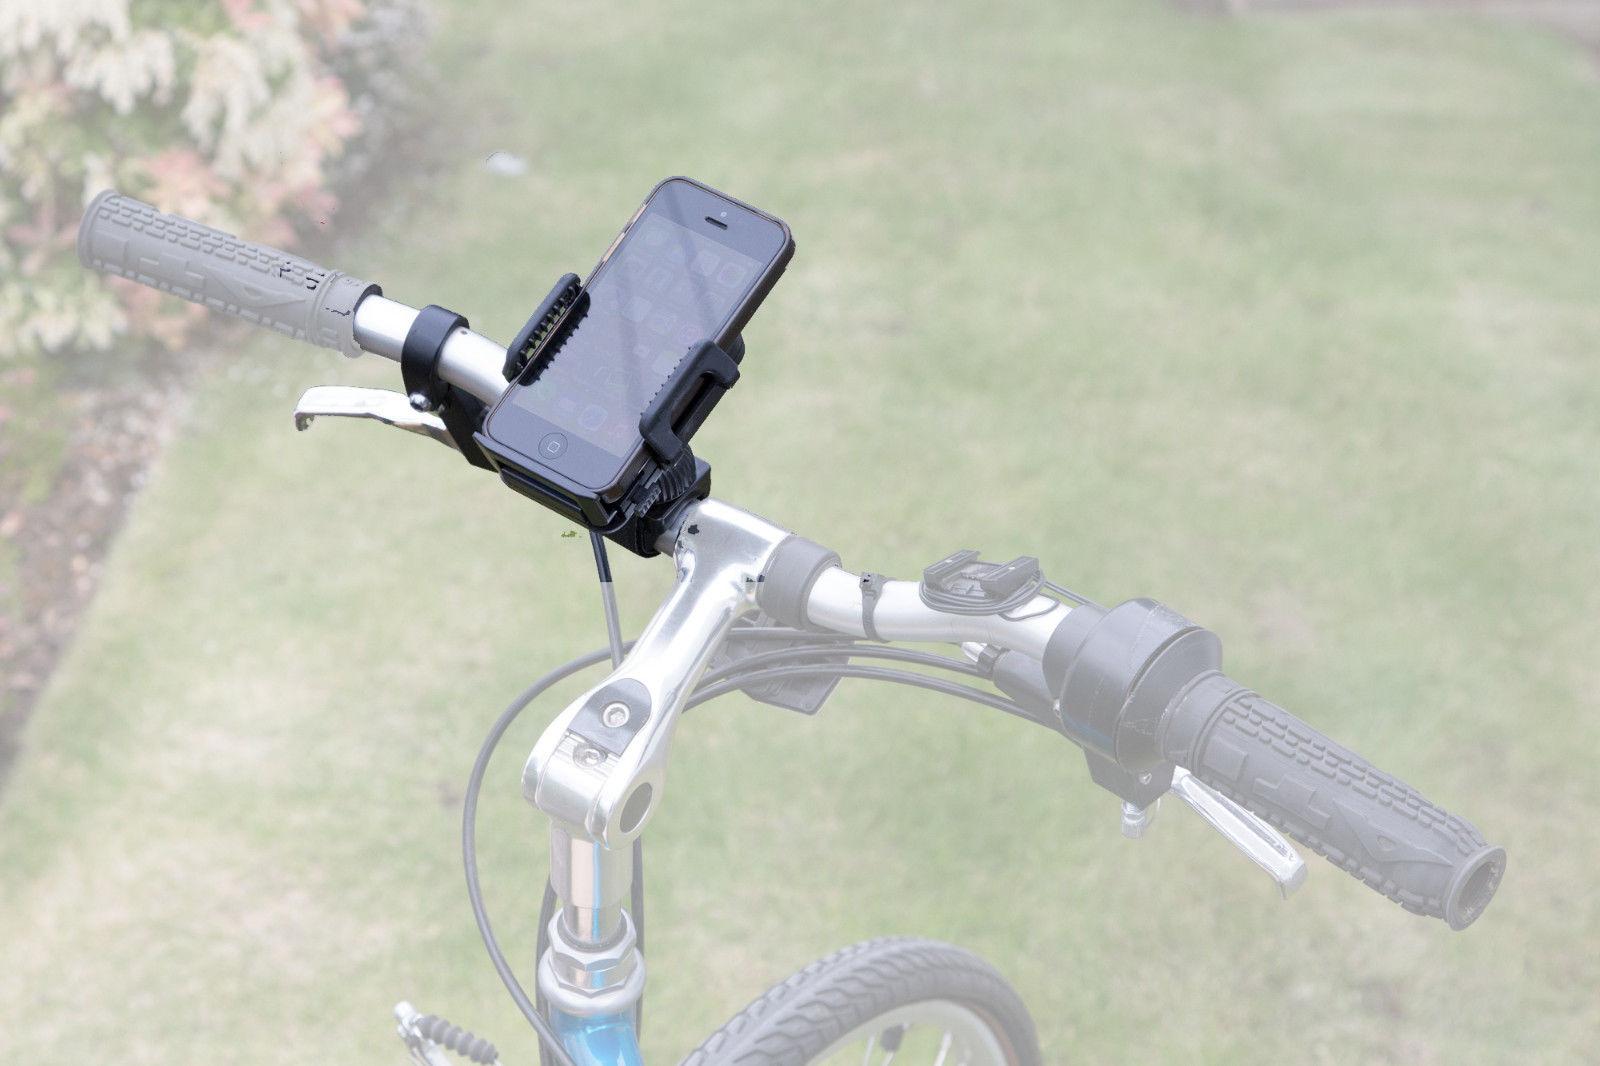 USサイクルキャリア Bicycle Handle Bar Cell Phone Mount by CommuteMate smartphone iphone Bike 自転車のハンドルバー携帯電話マウントCommuteMateスマートフォンiphoneのバイク